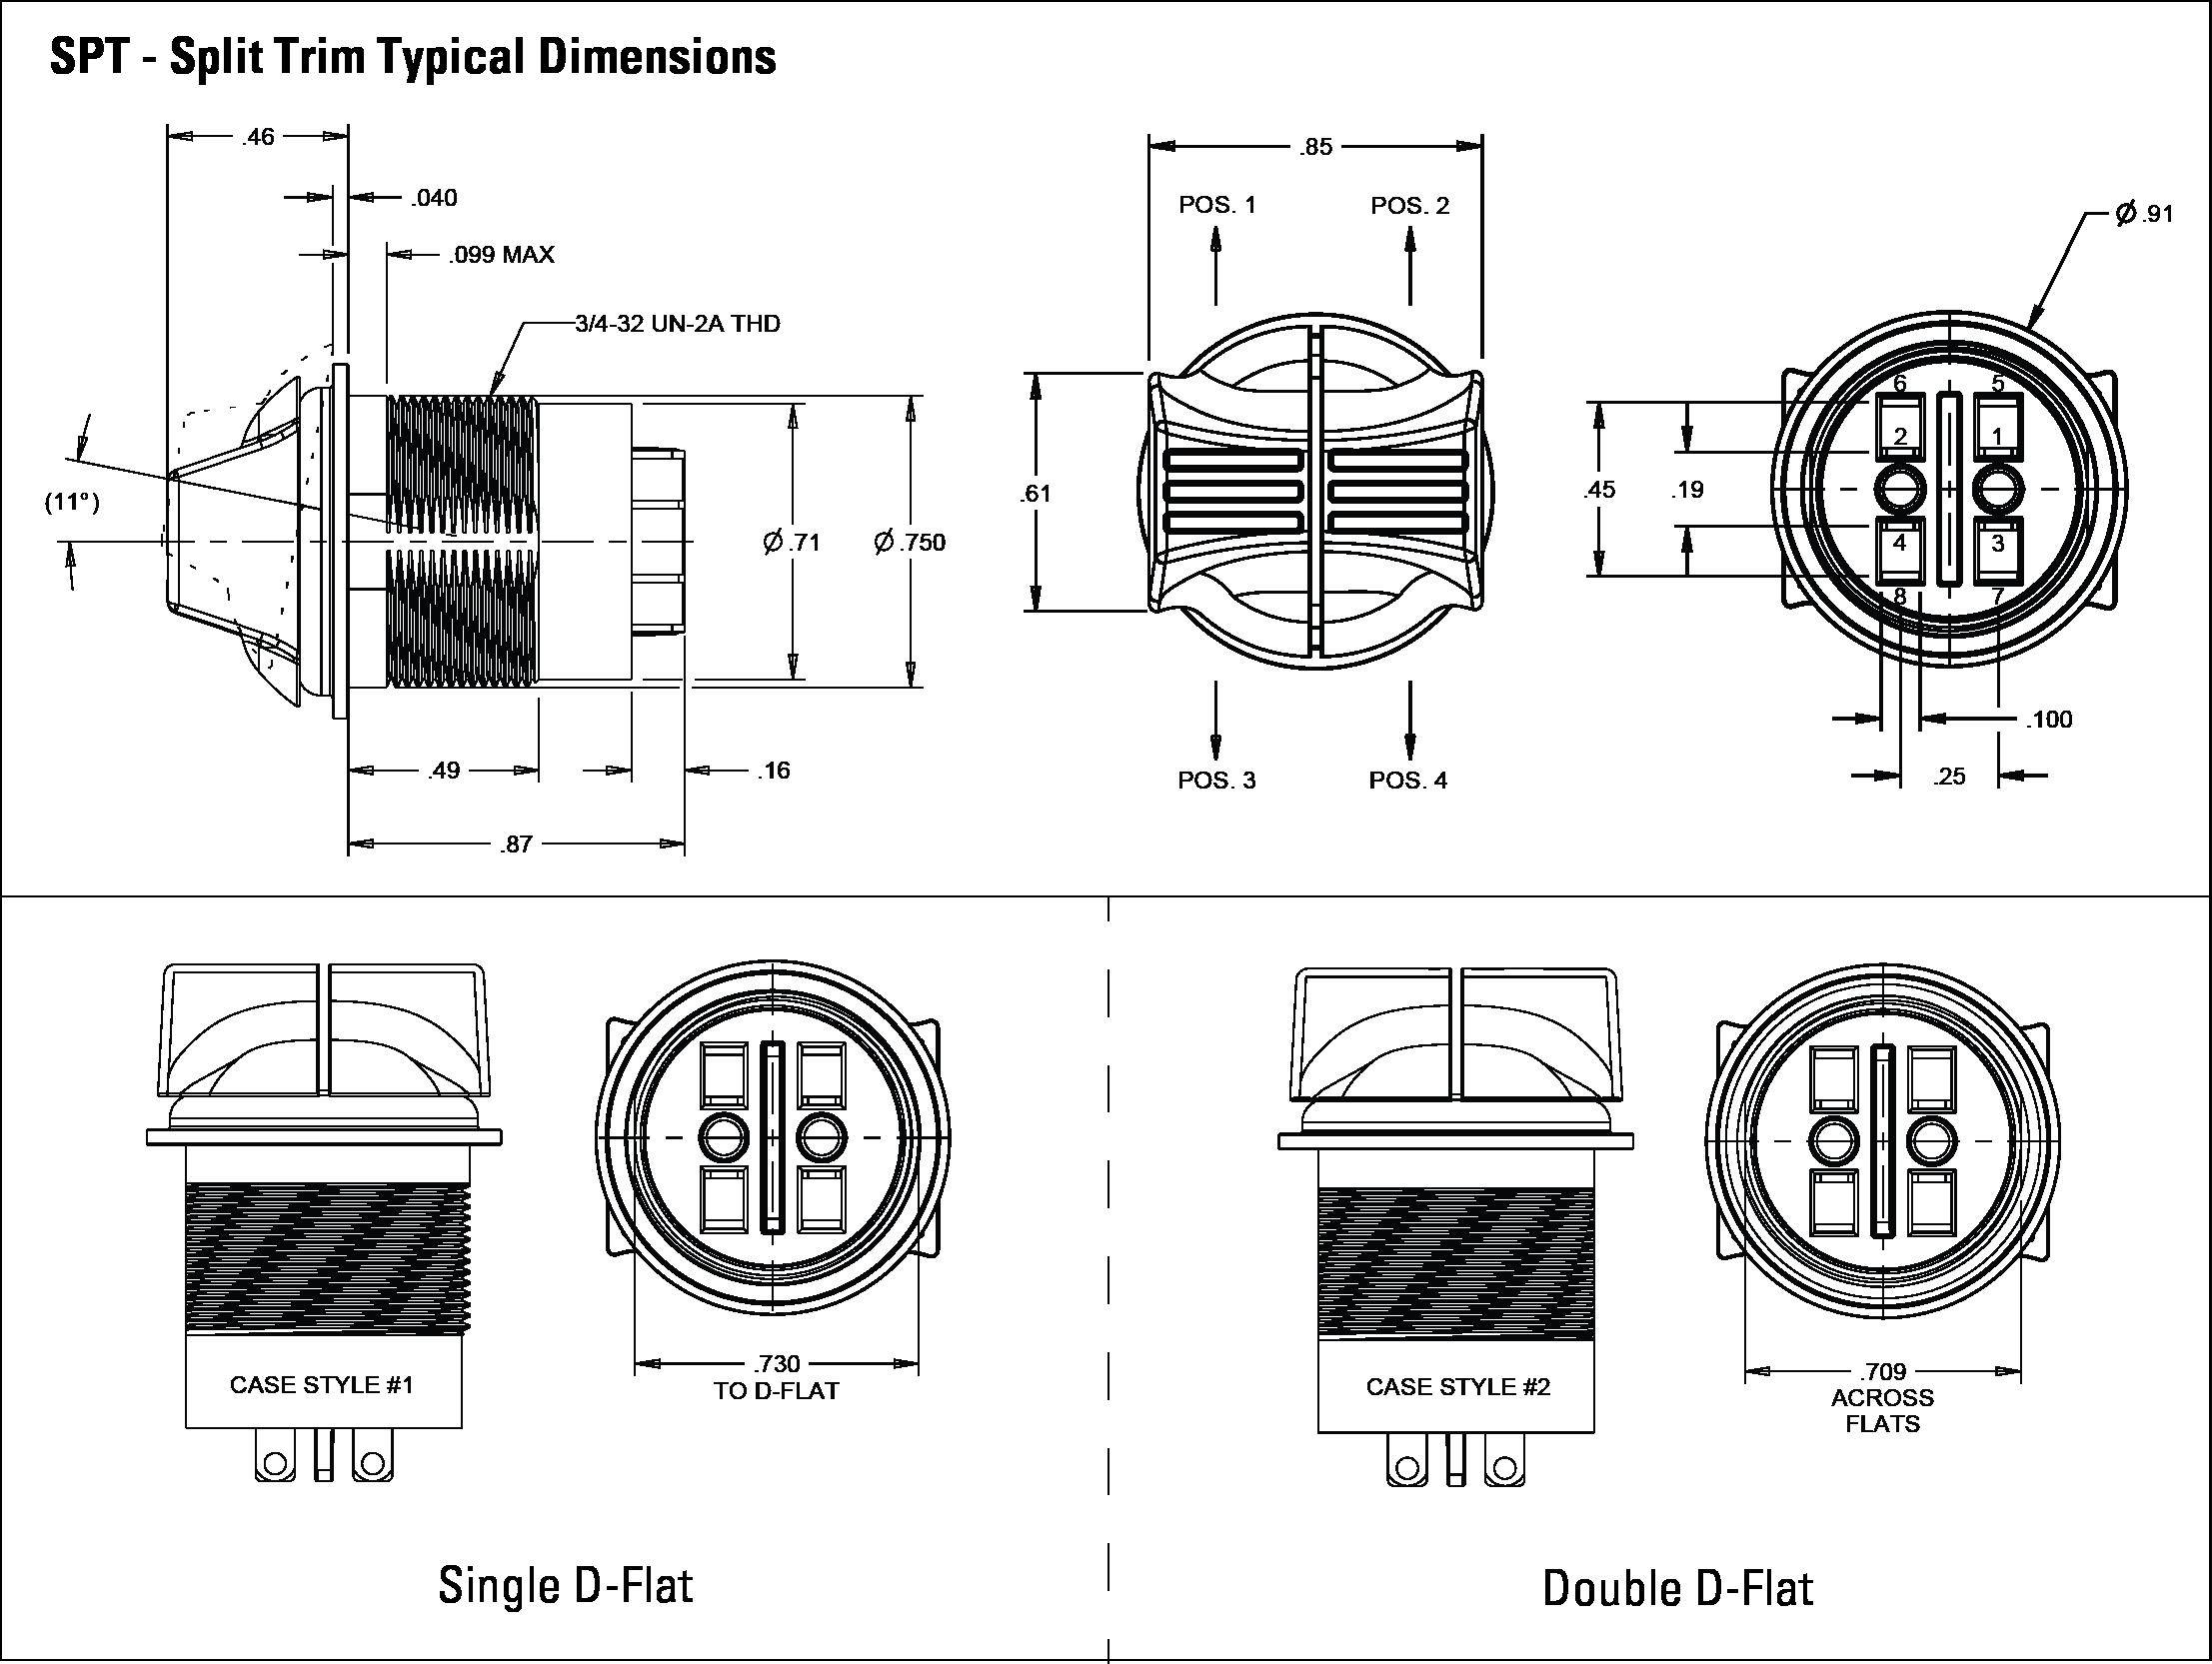 split trim switches supplier  u2013 otto controls